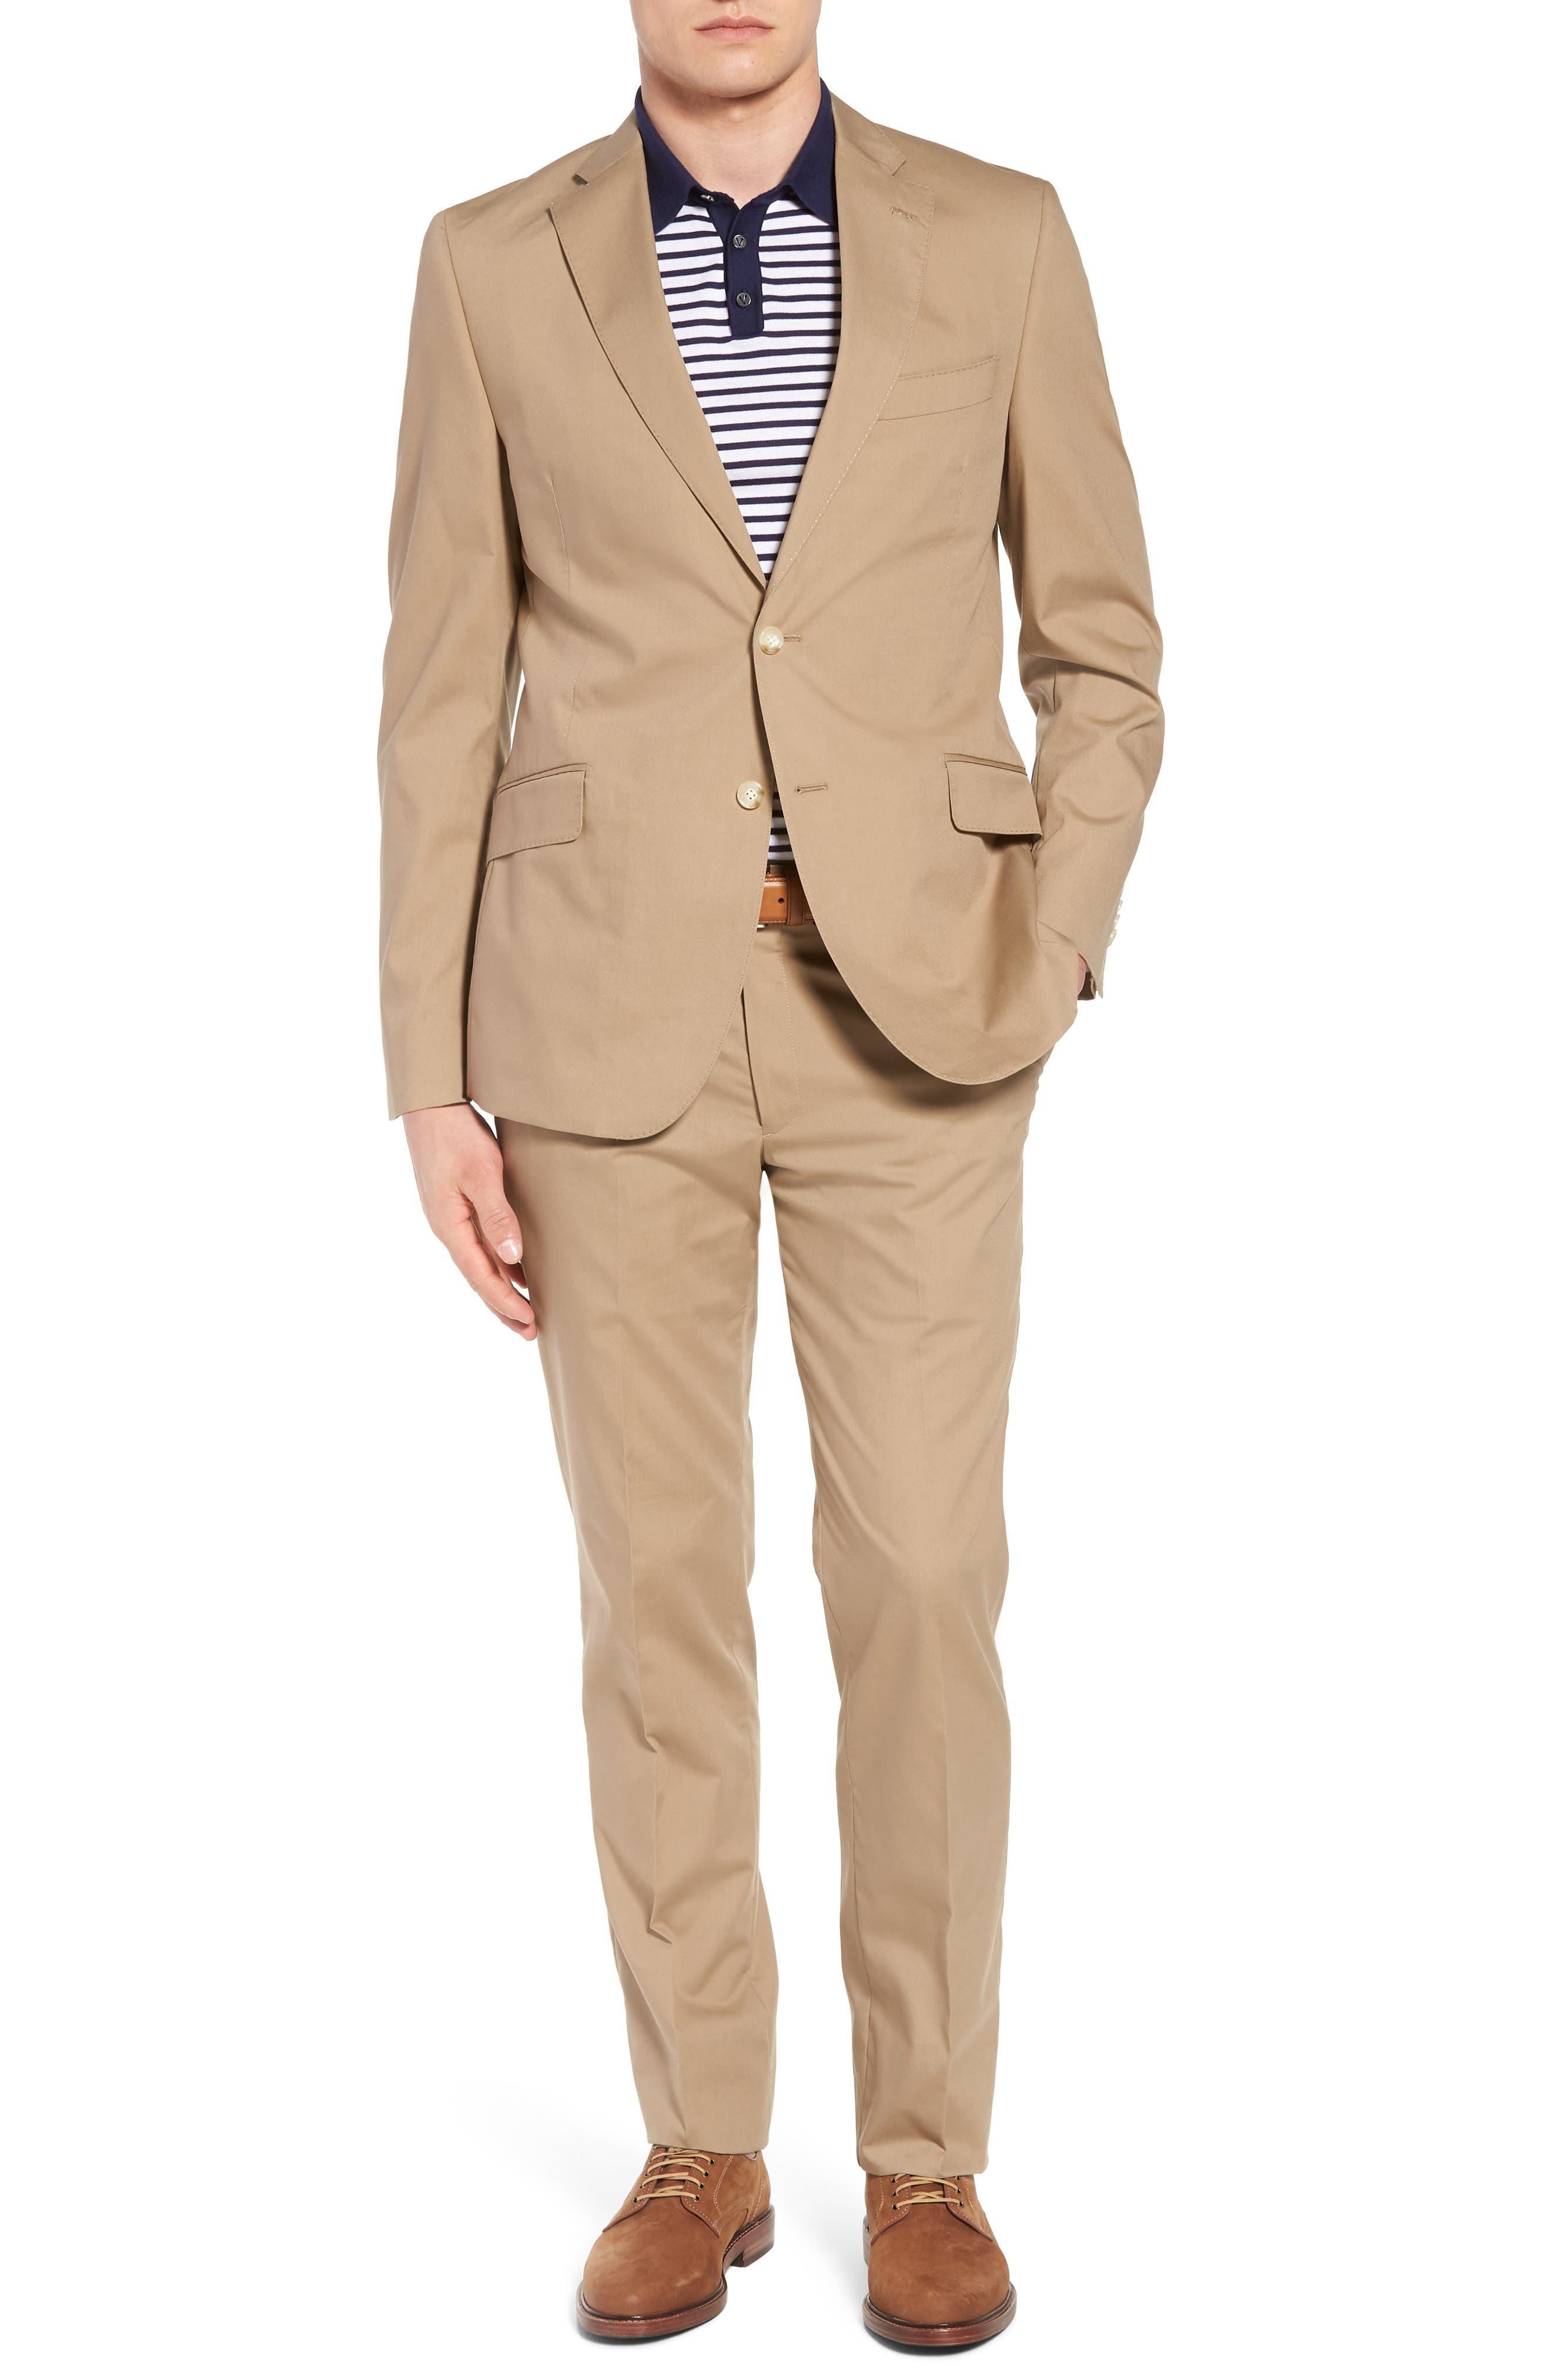 Irons AIM Classic Fit Solid Cotton Blend Suit,                         Main,                         color, 252